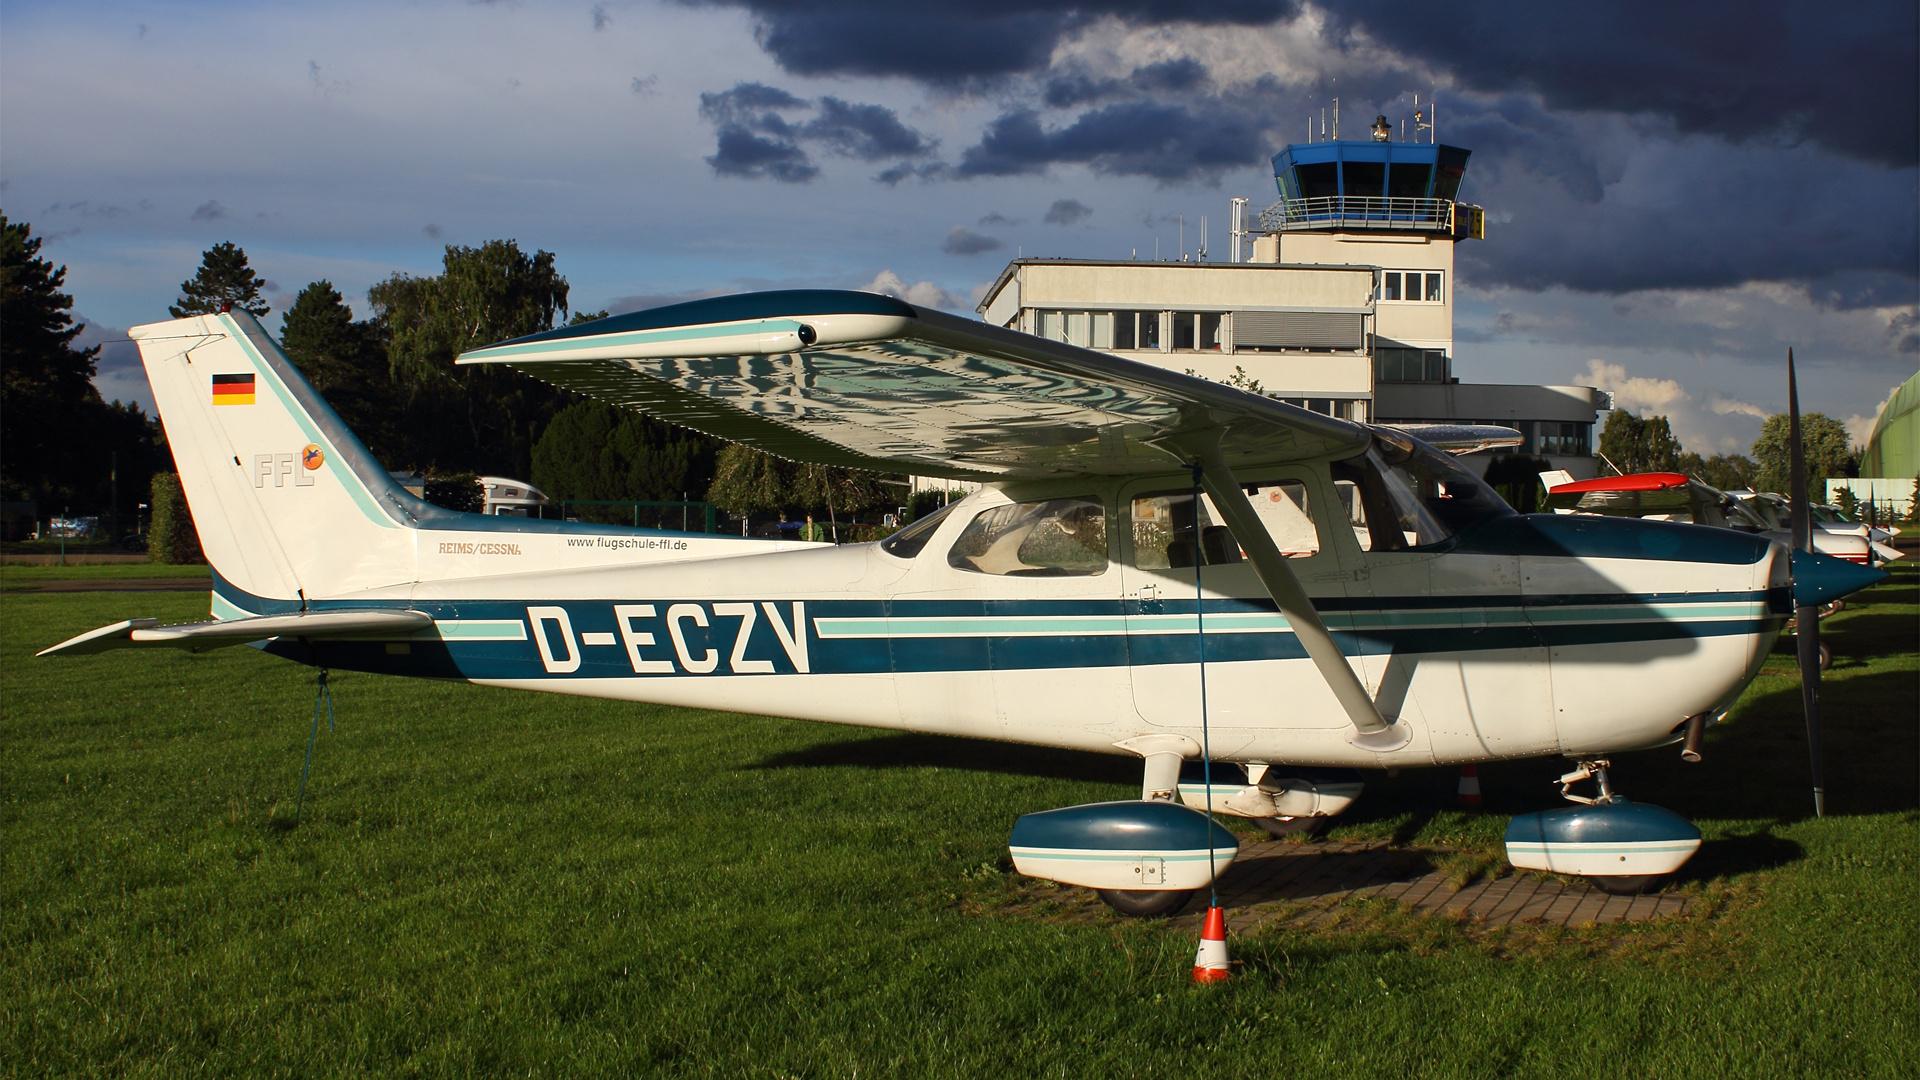 D-ECZV-1 C172 ESS 201509